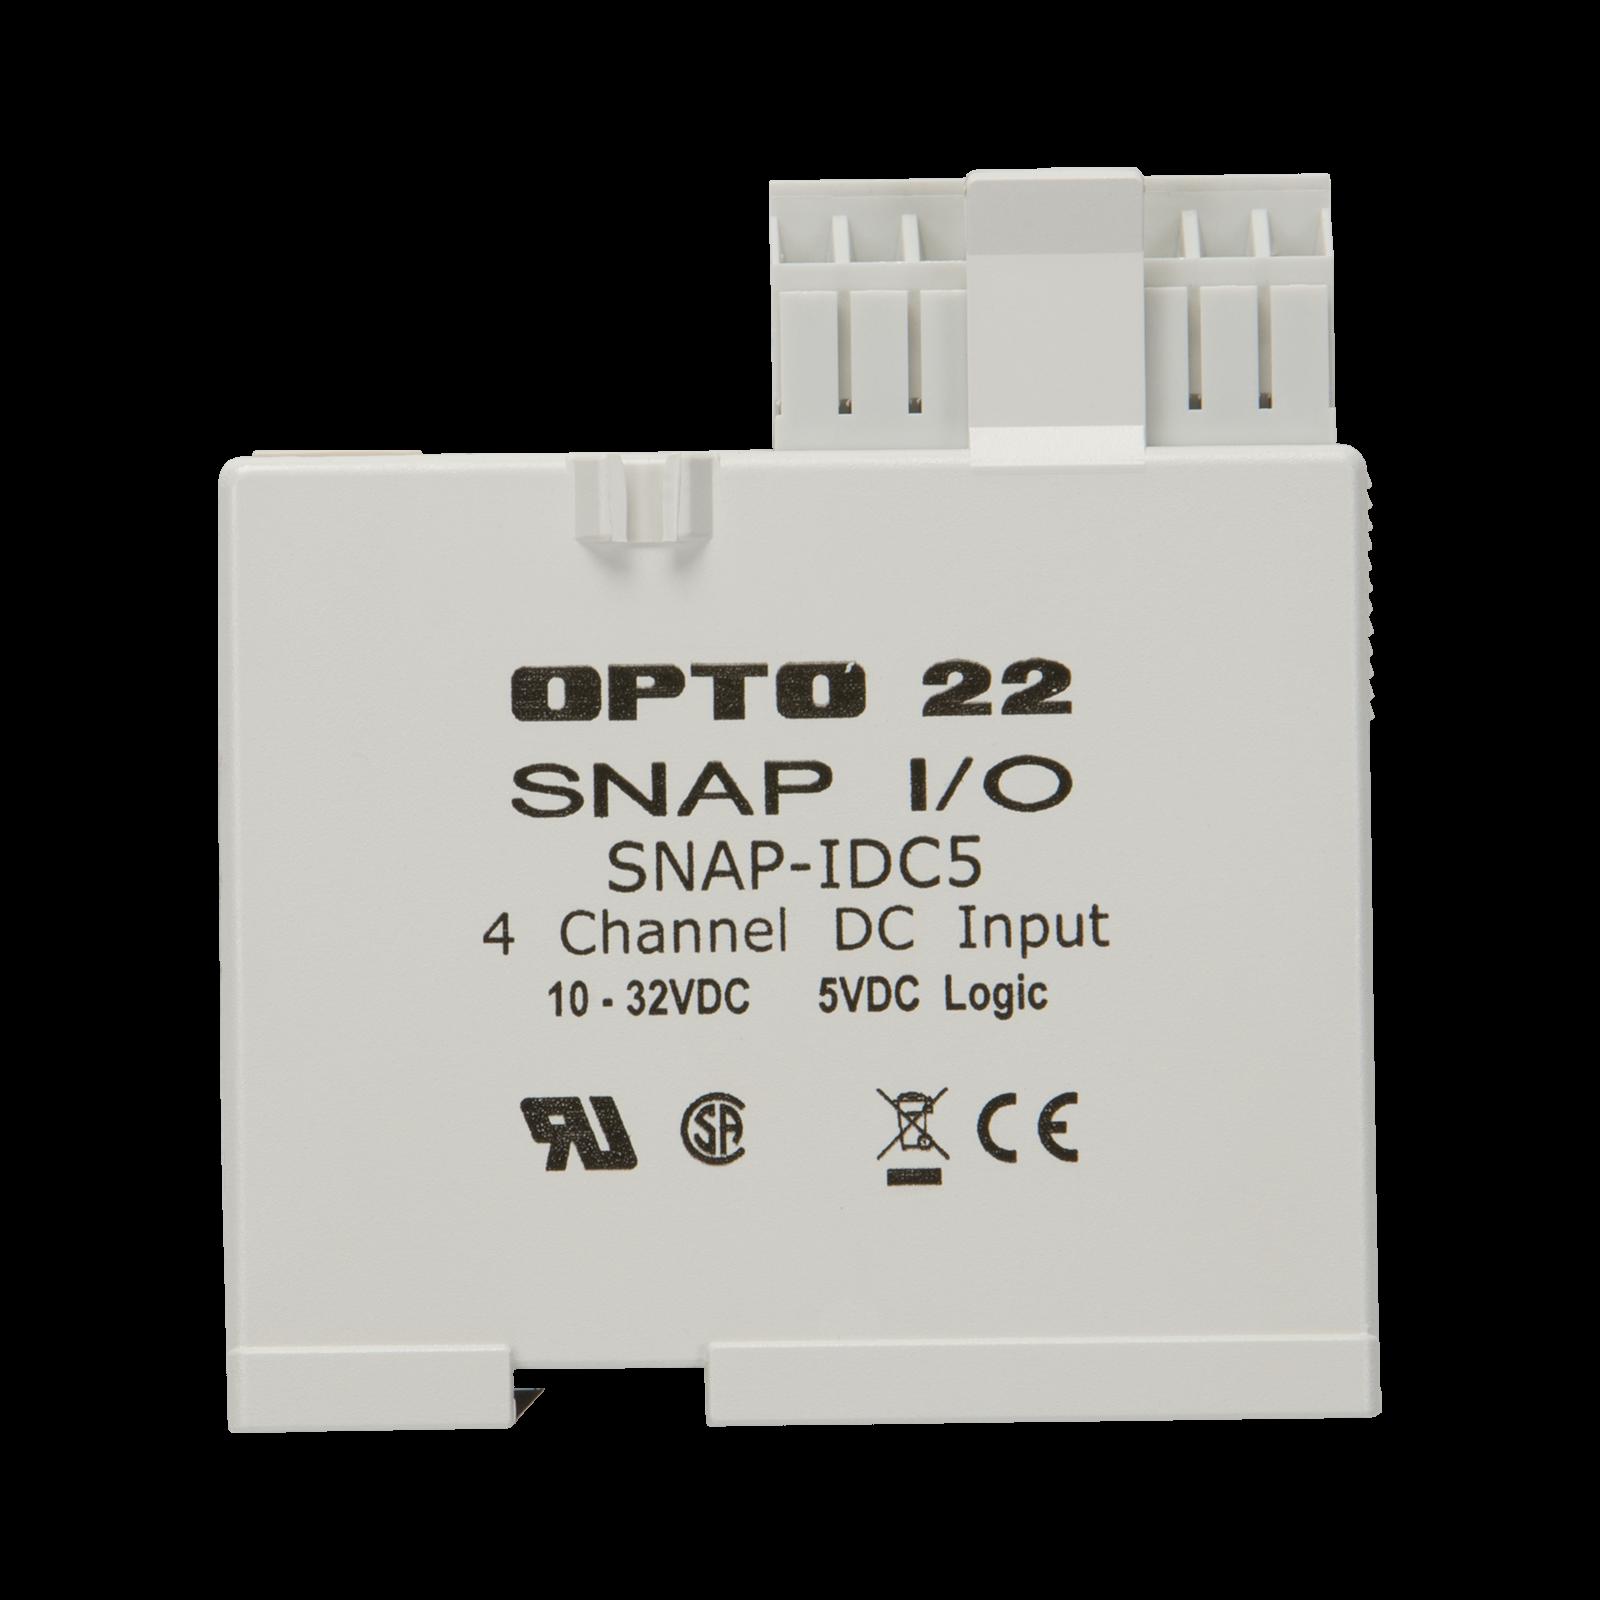 SNAP-IDC5 digital input module